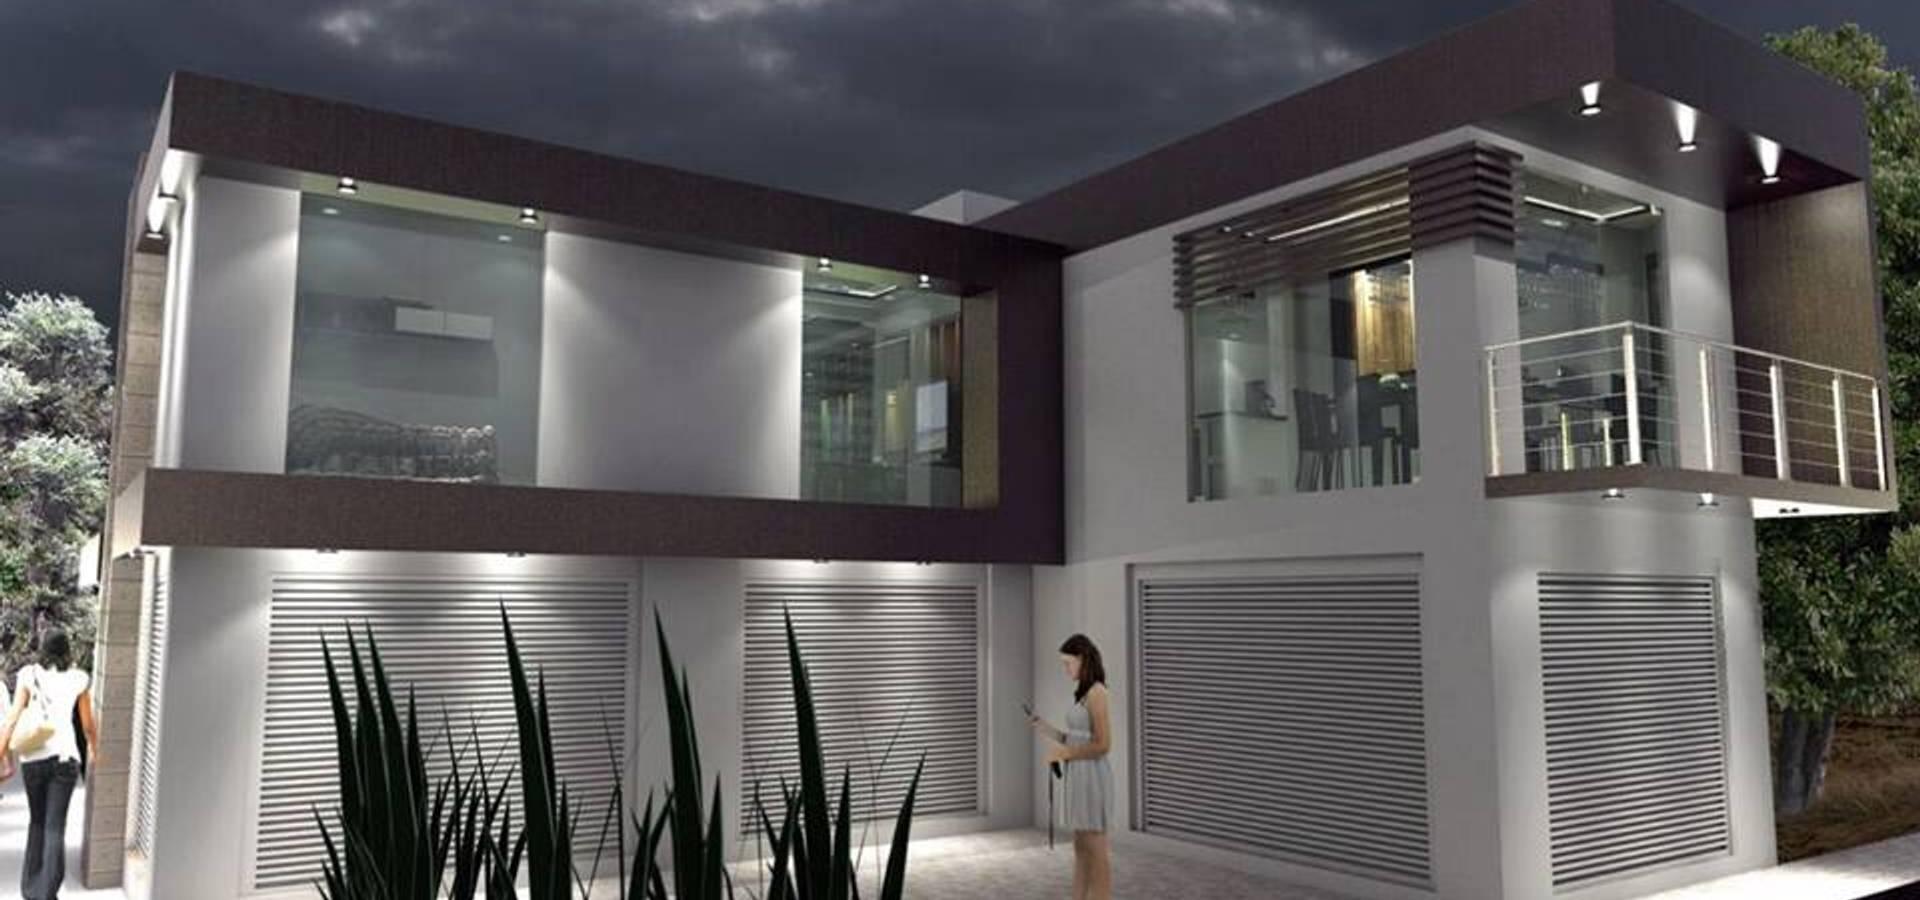 A&E Diseño Arquitectonico